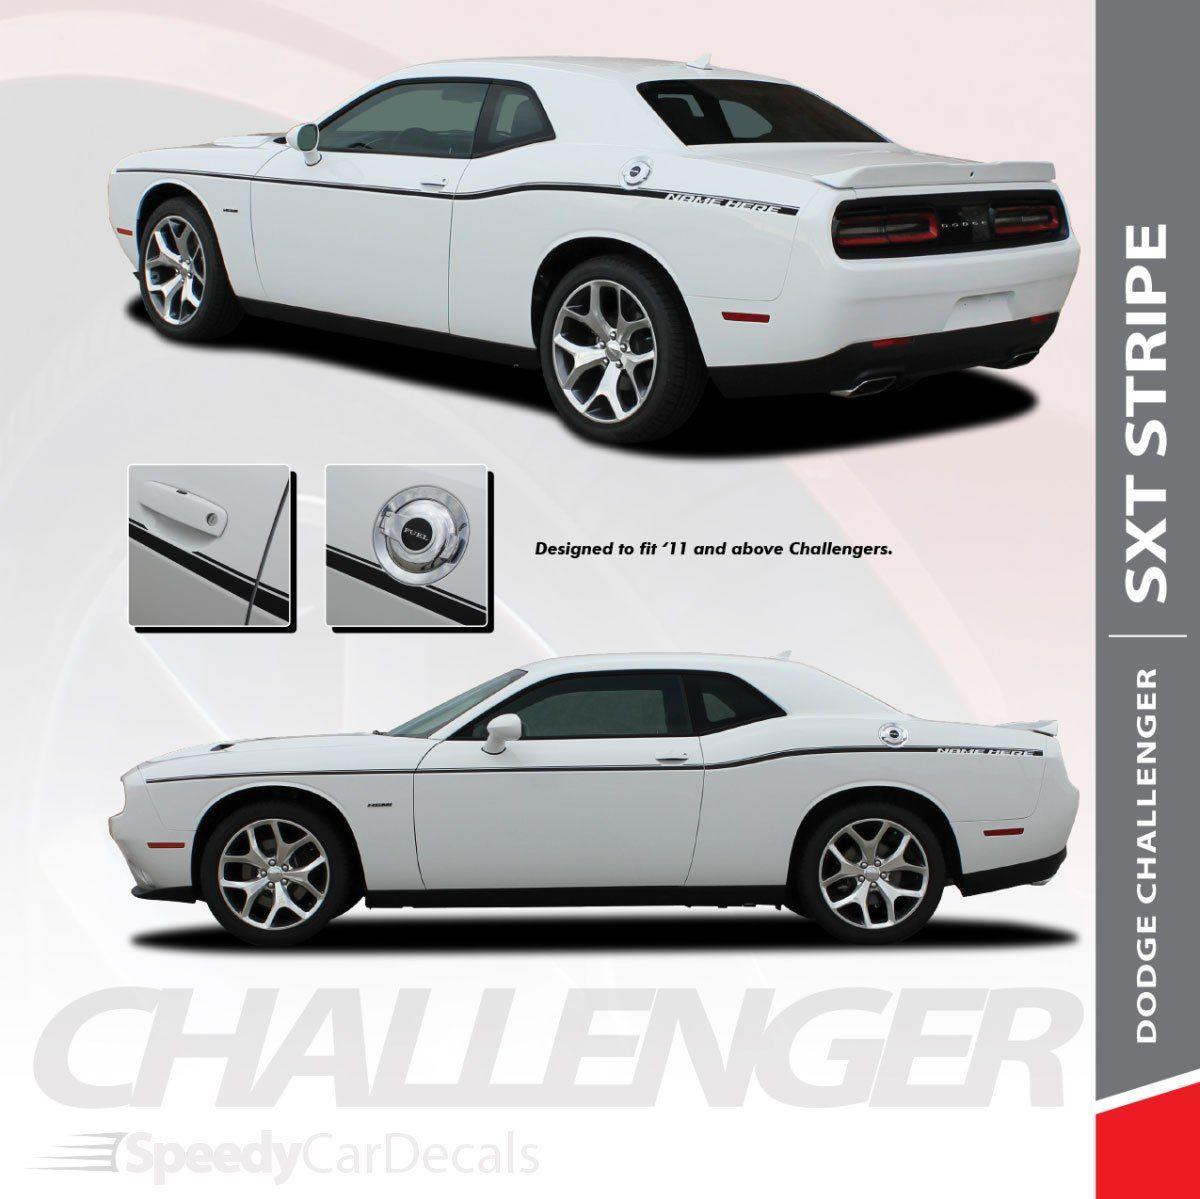 SXTDodge Challenger Graphics Kit Side Stripe Decals 2011-2018 3M Wet Install